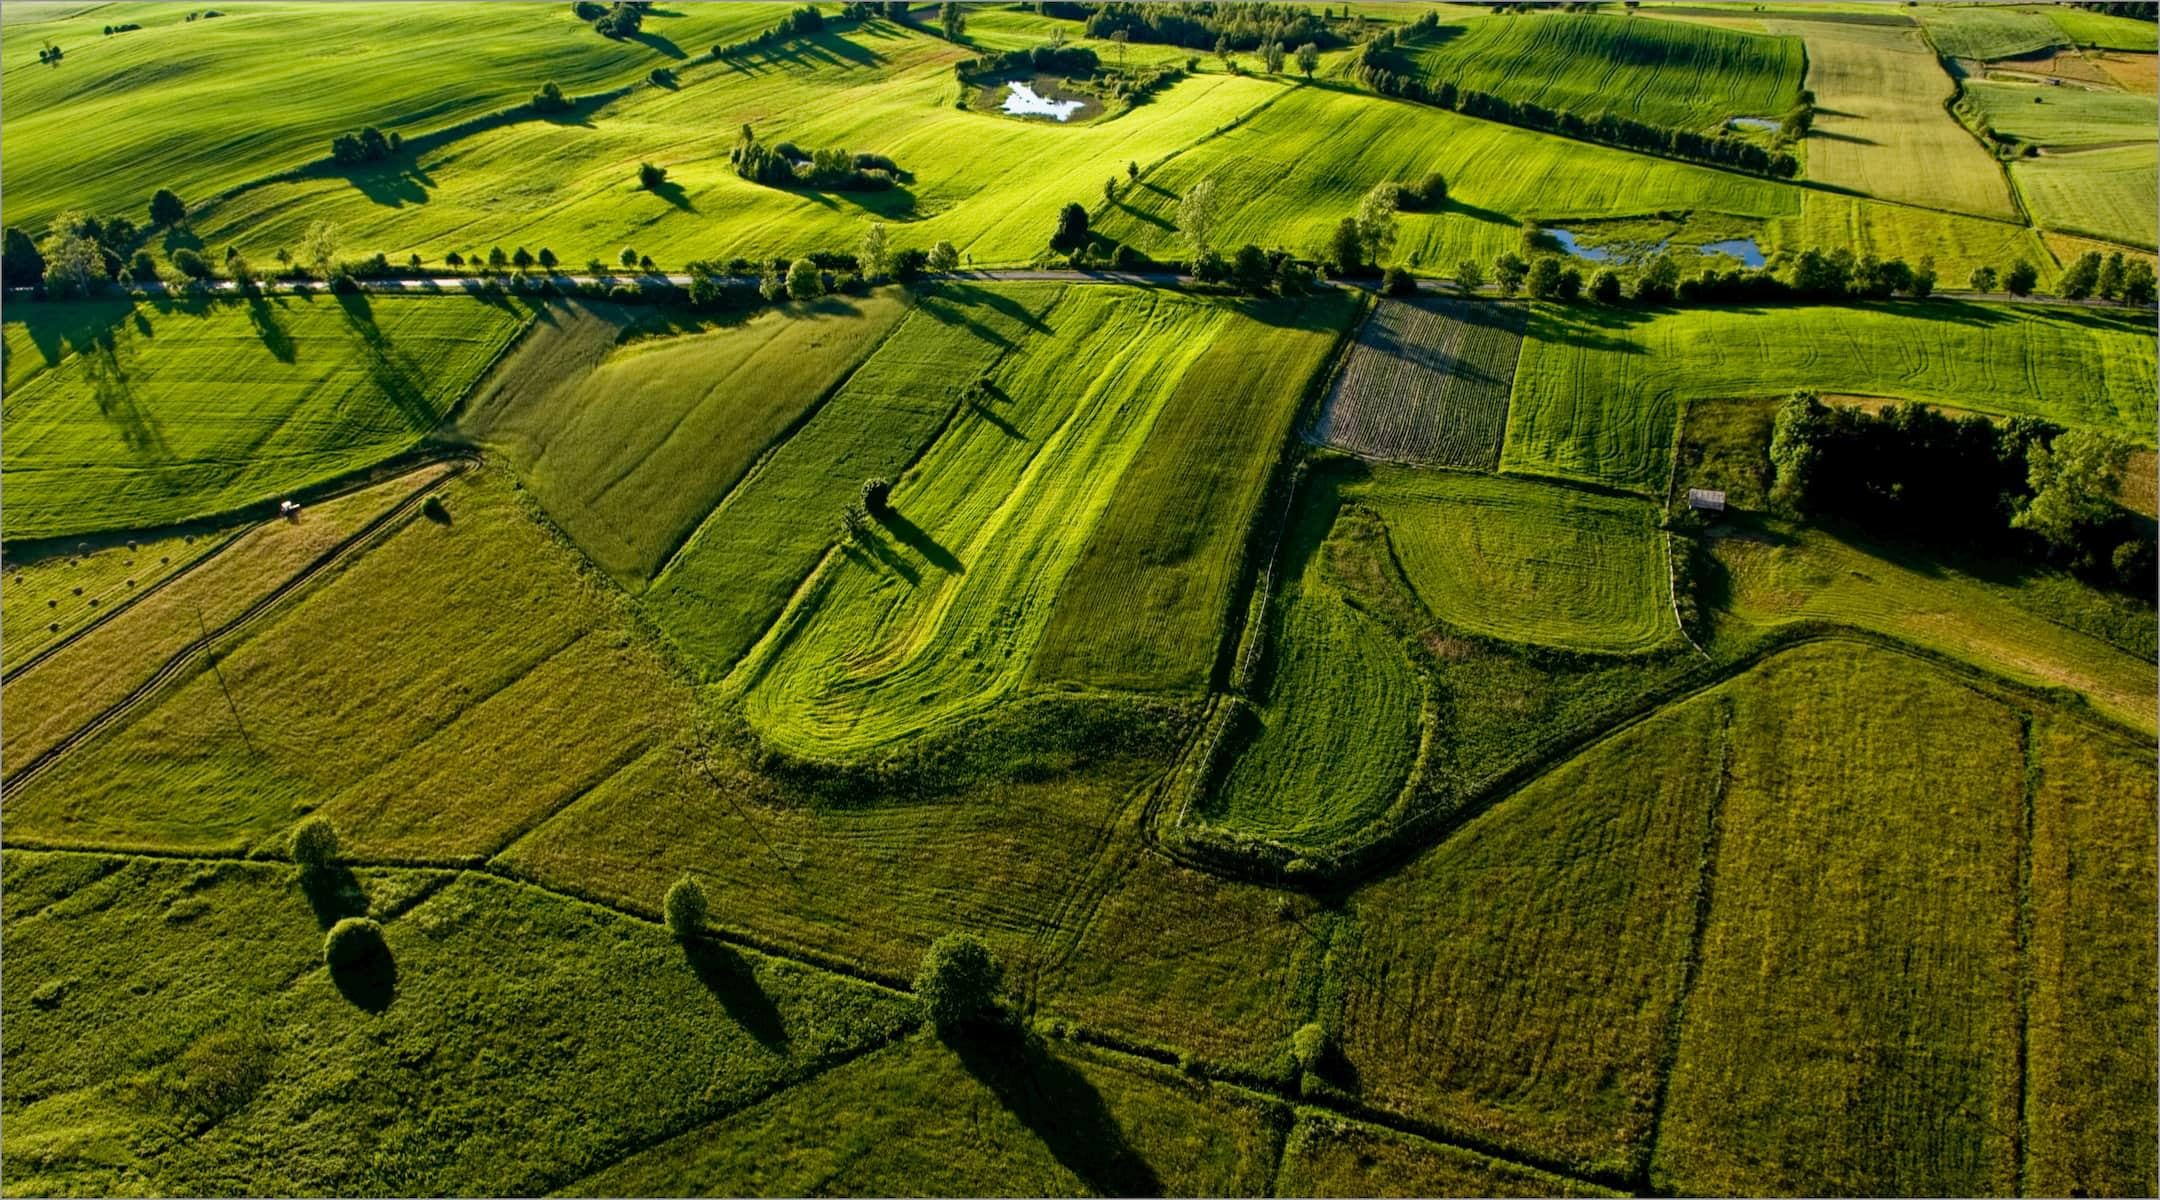 a green farm field